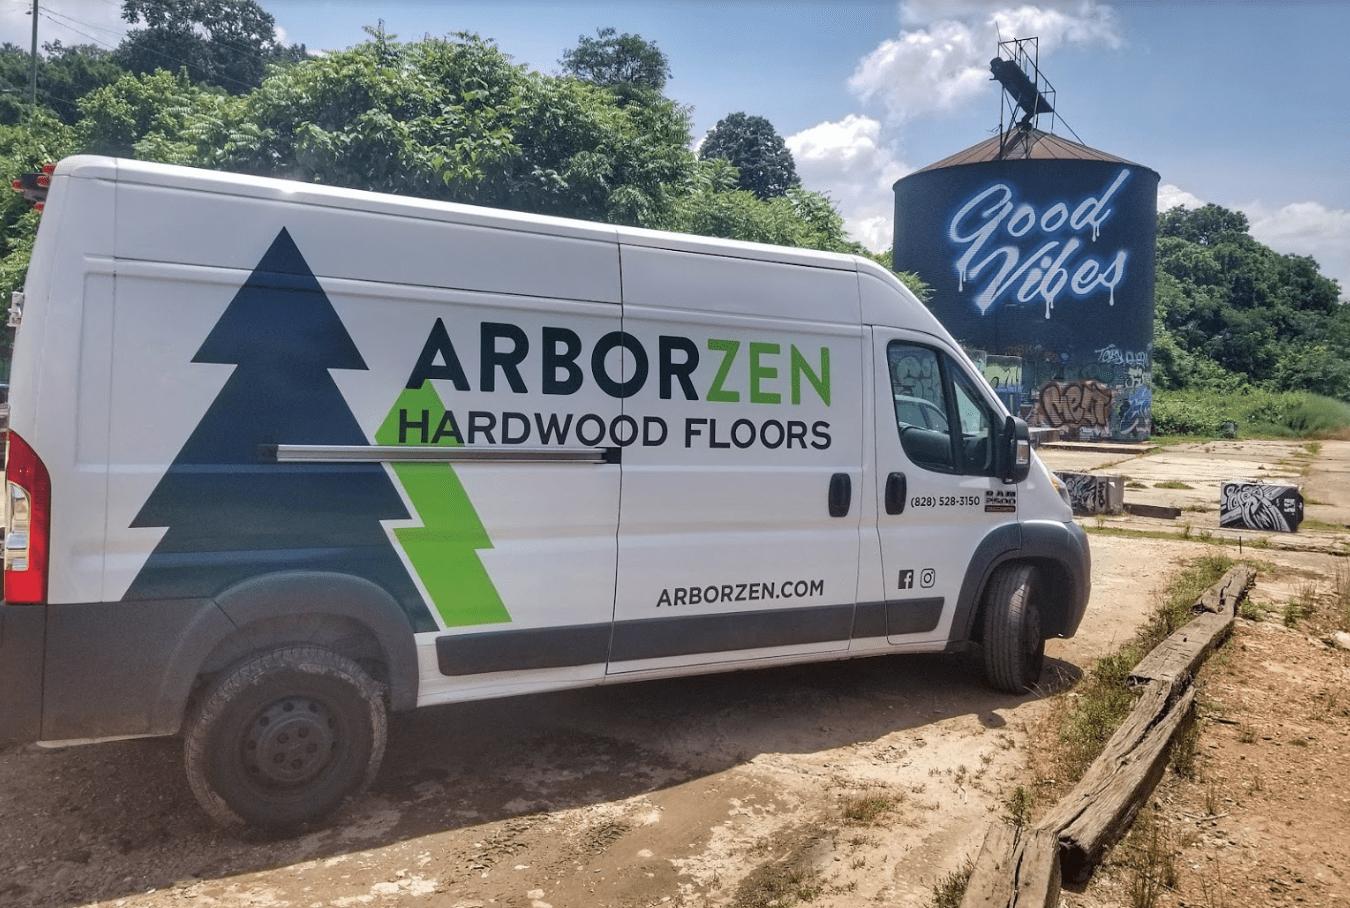 Good Vibes from Arbor Zen Hardwood Floors